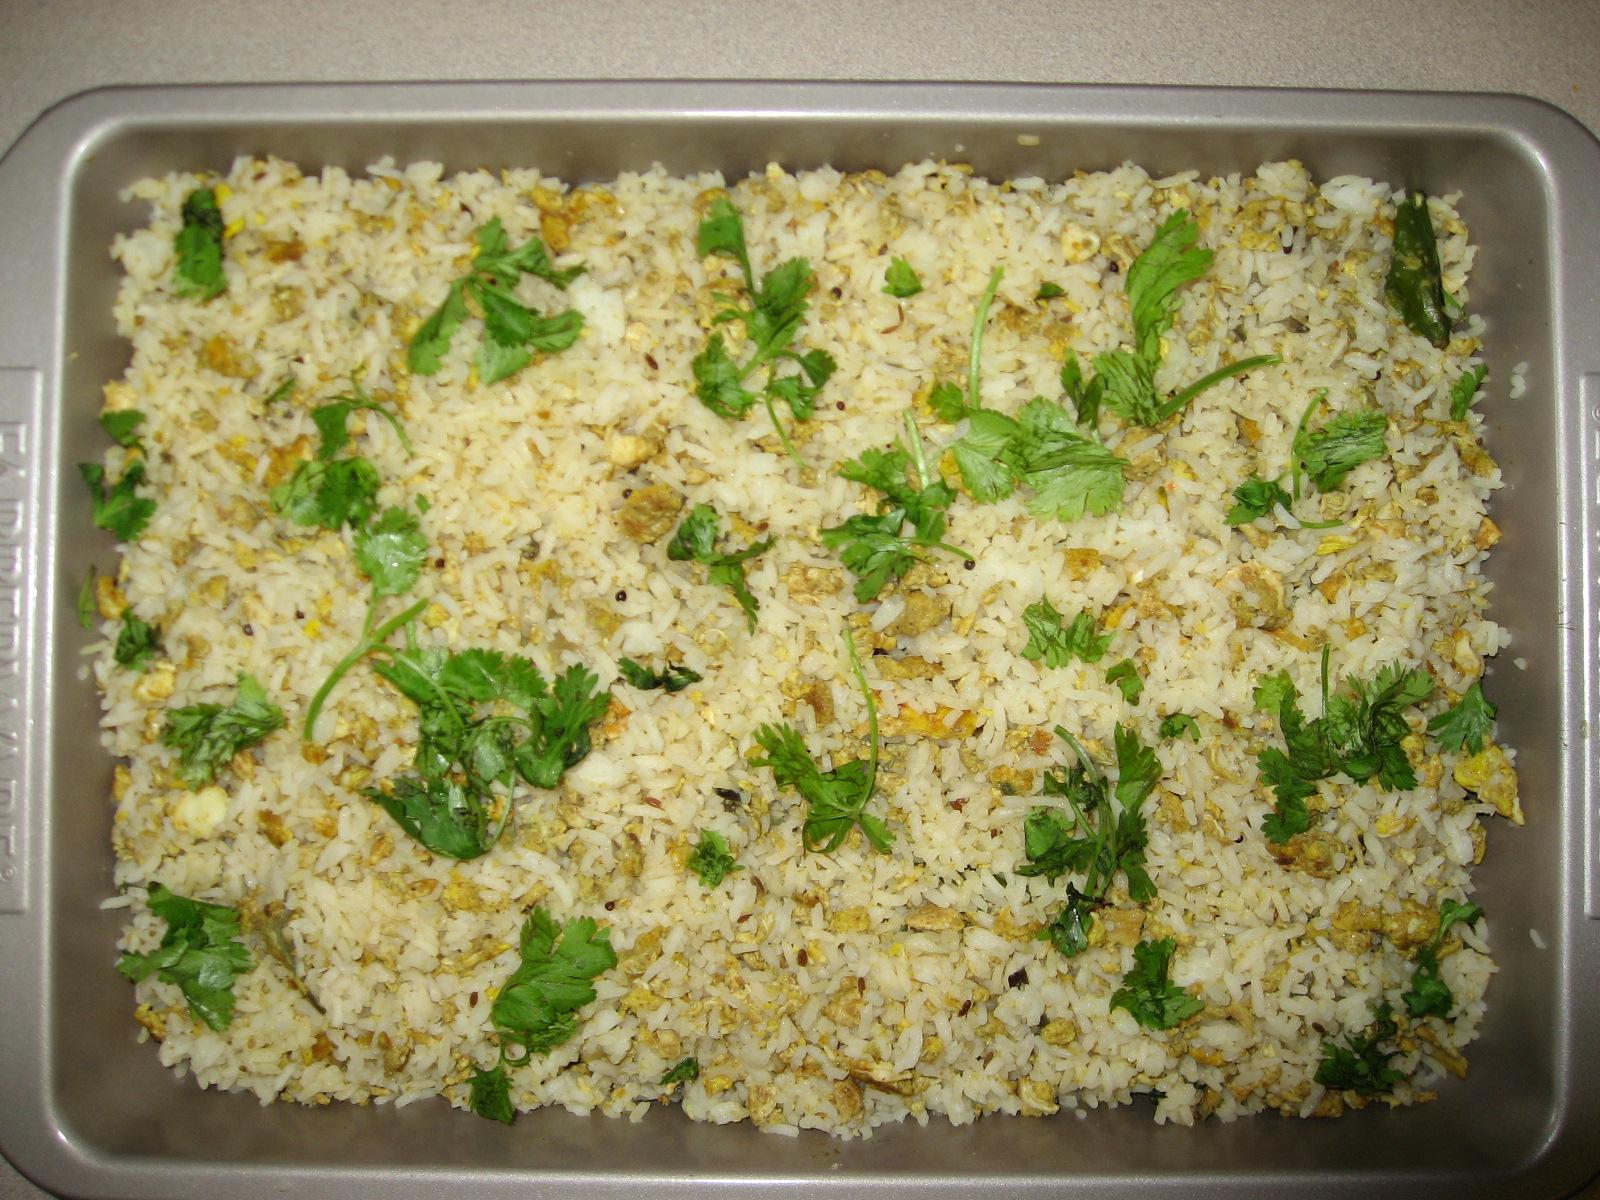 Fried rice using dry rice